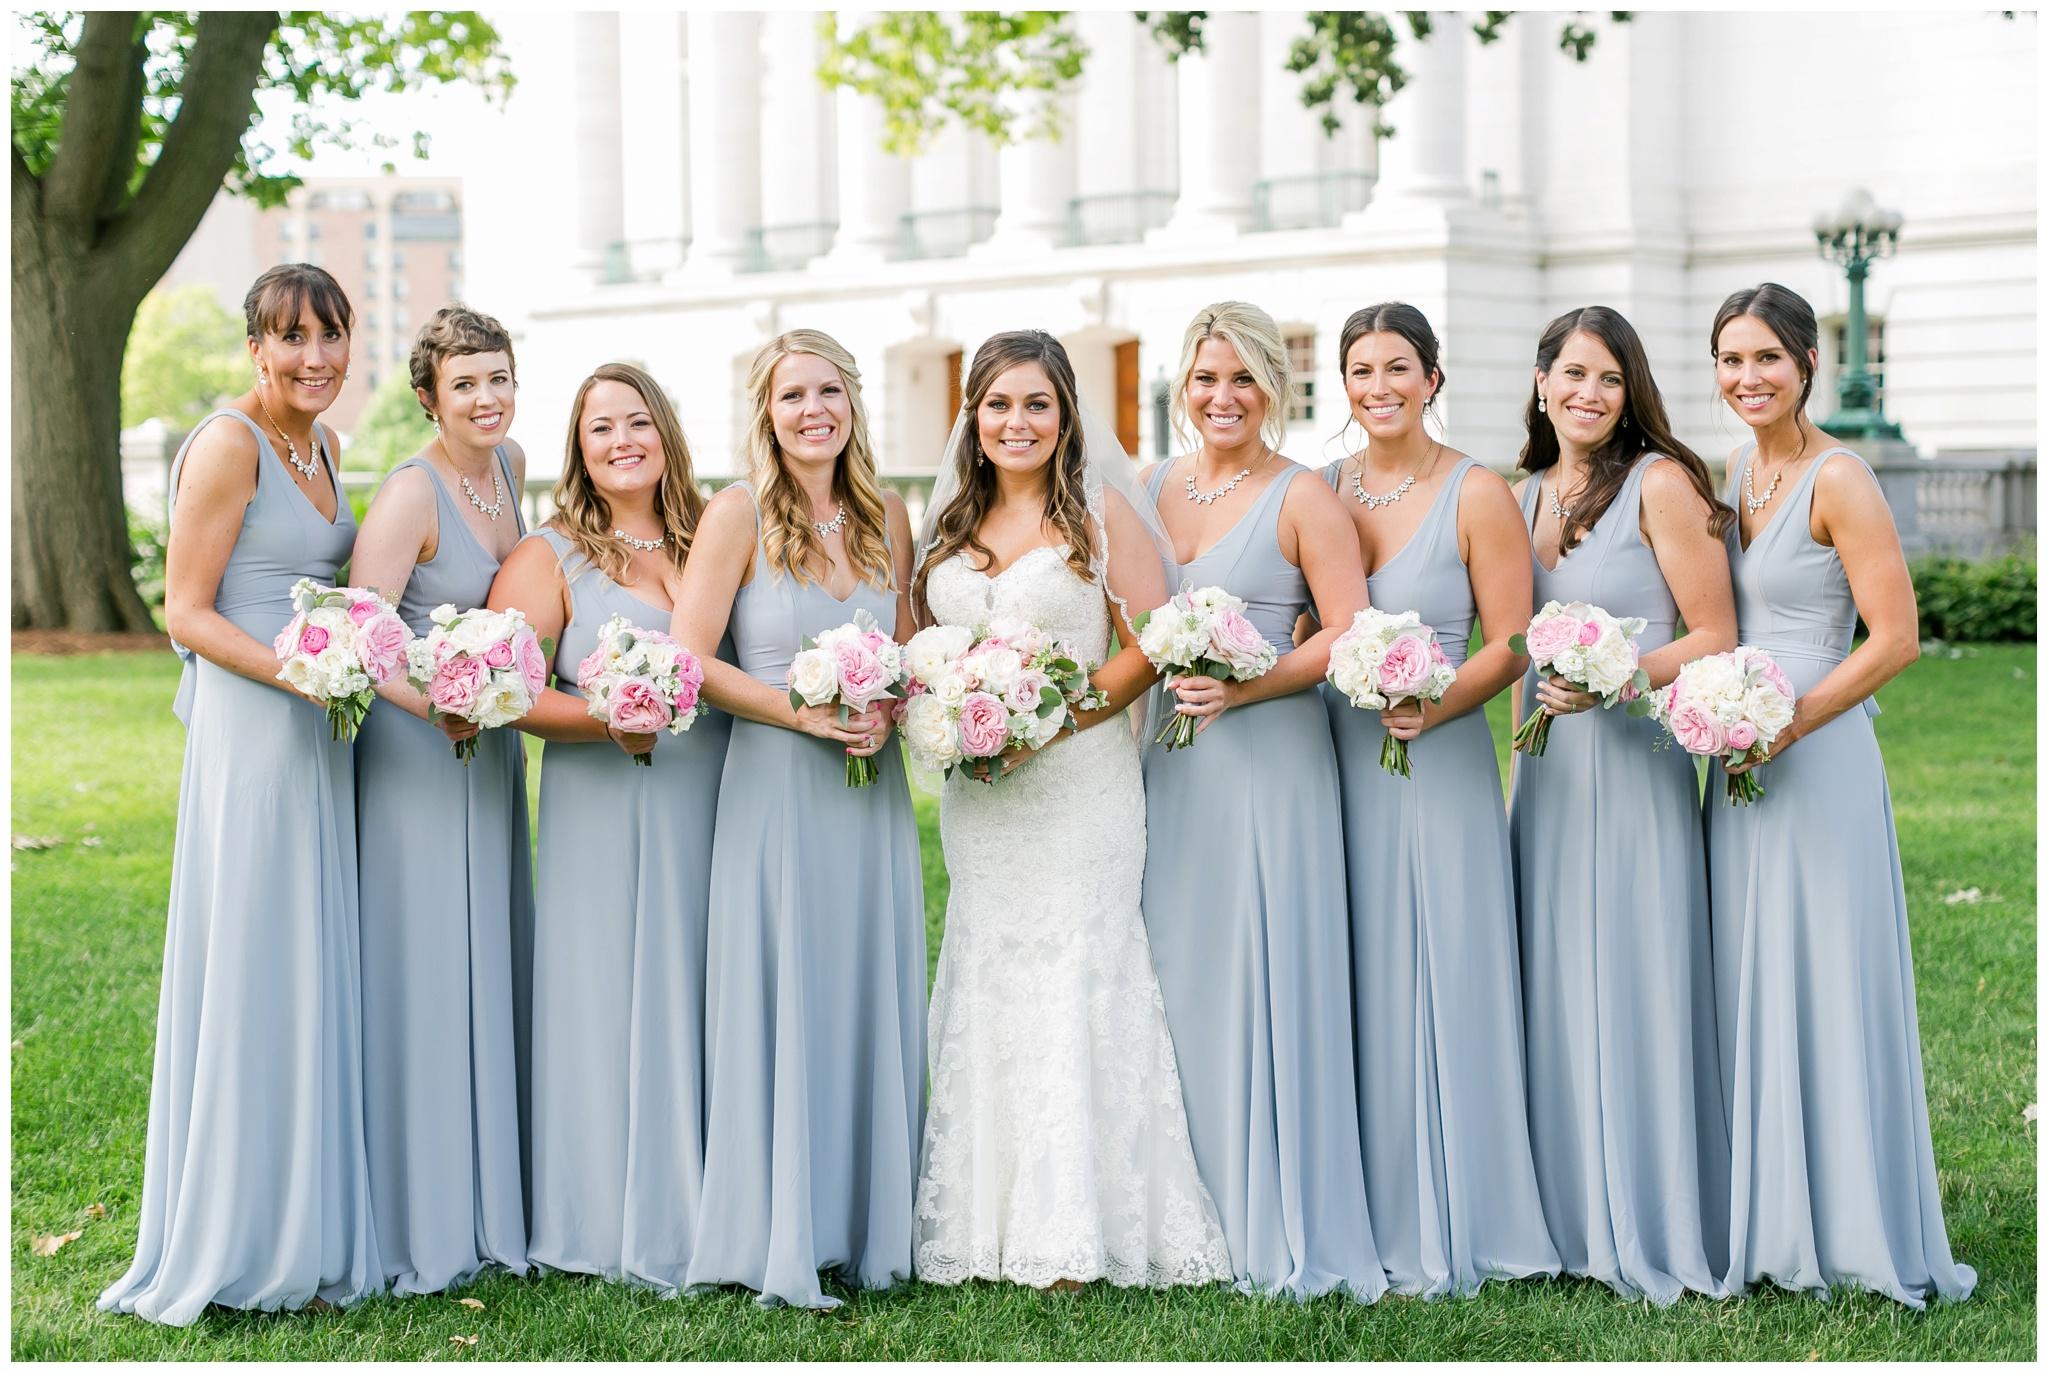 UW_Memorial_Union_wedding_madison_wisconsin_wedding_photographers_4614.jpg